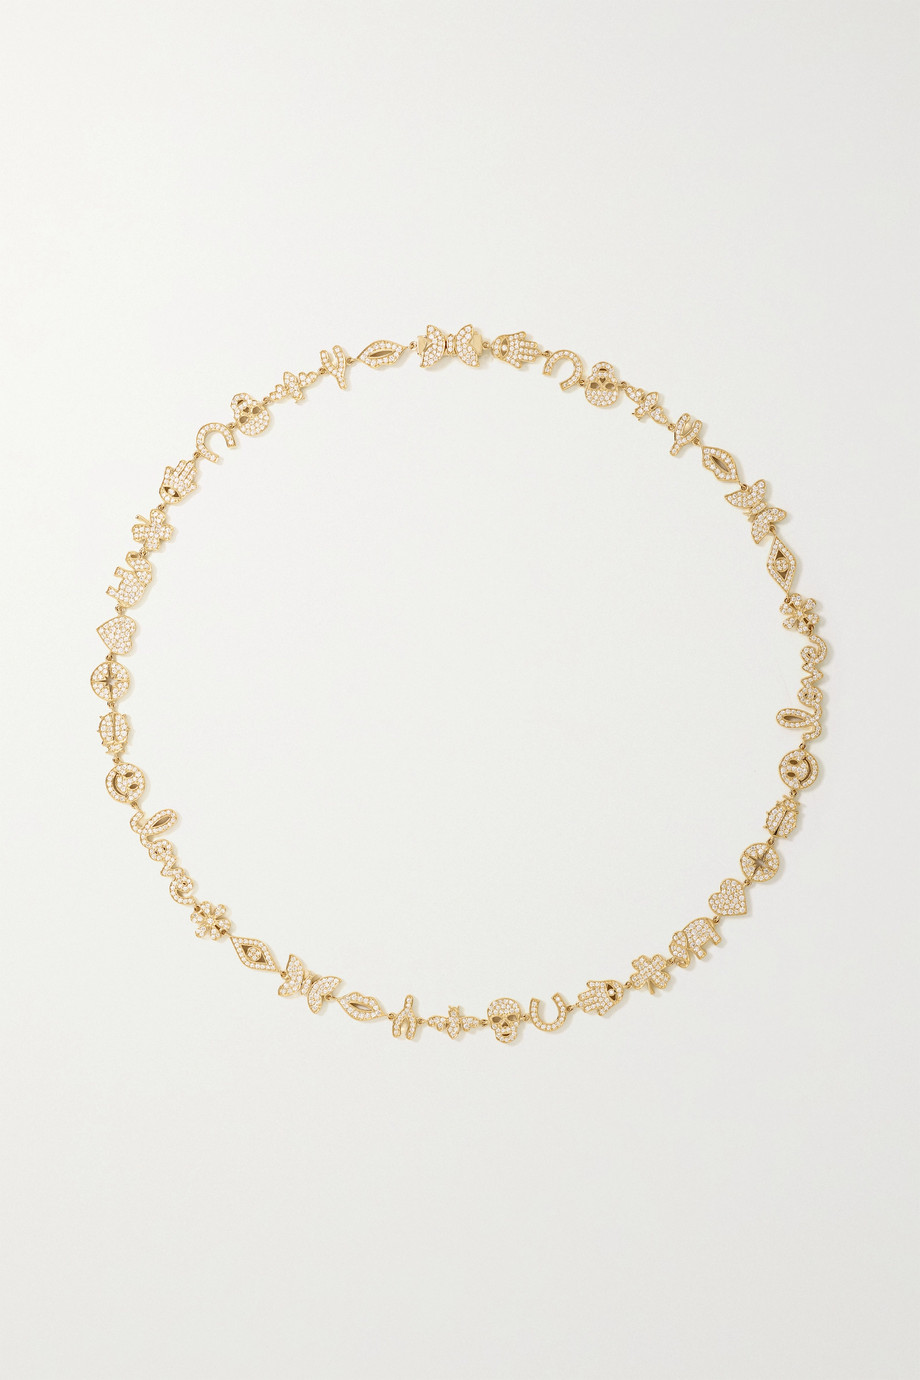 Sydney Evan Collier en or 14 carats et diamants Anniversary Small